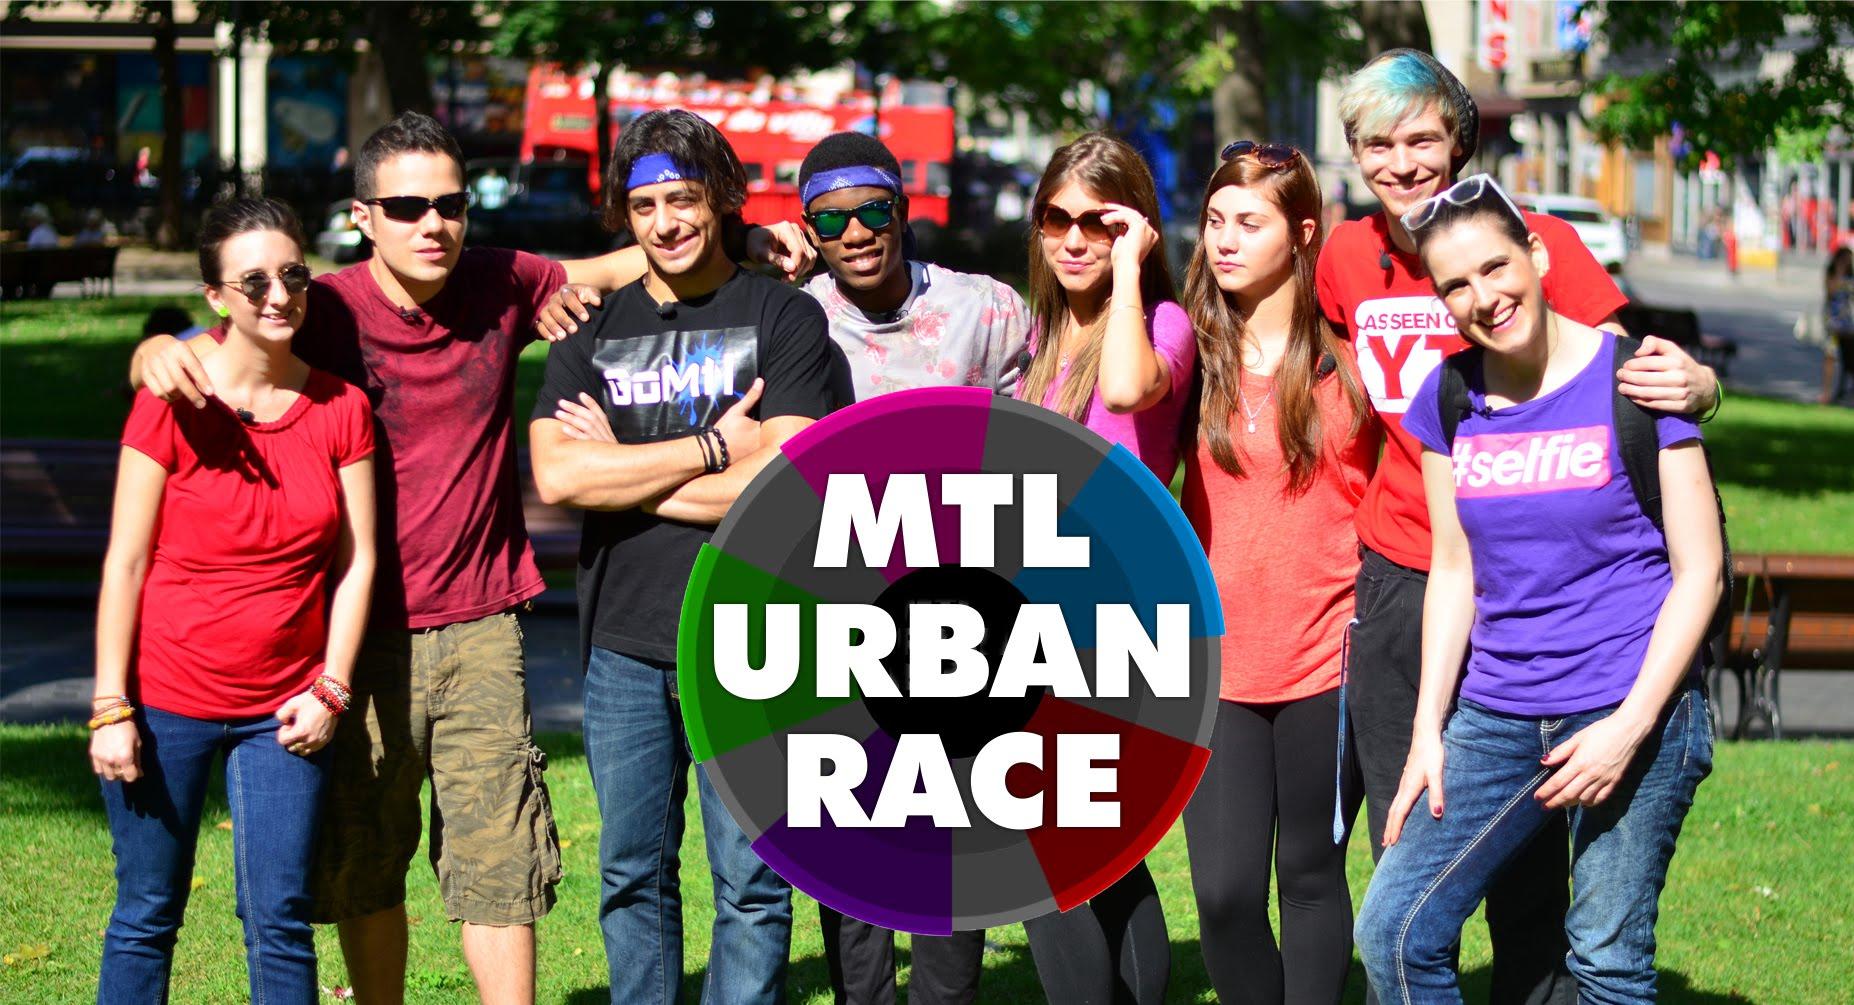 MTL urban race people posing